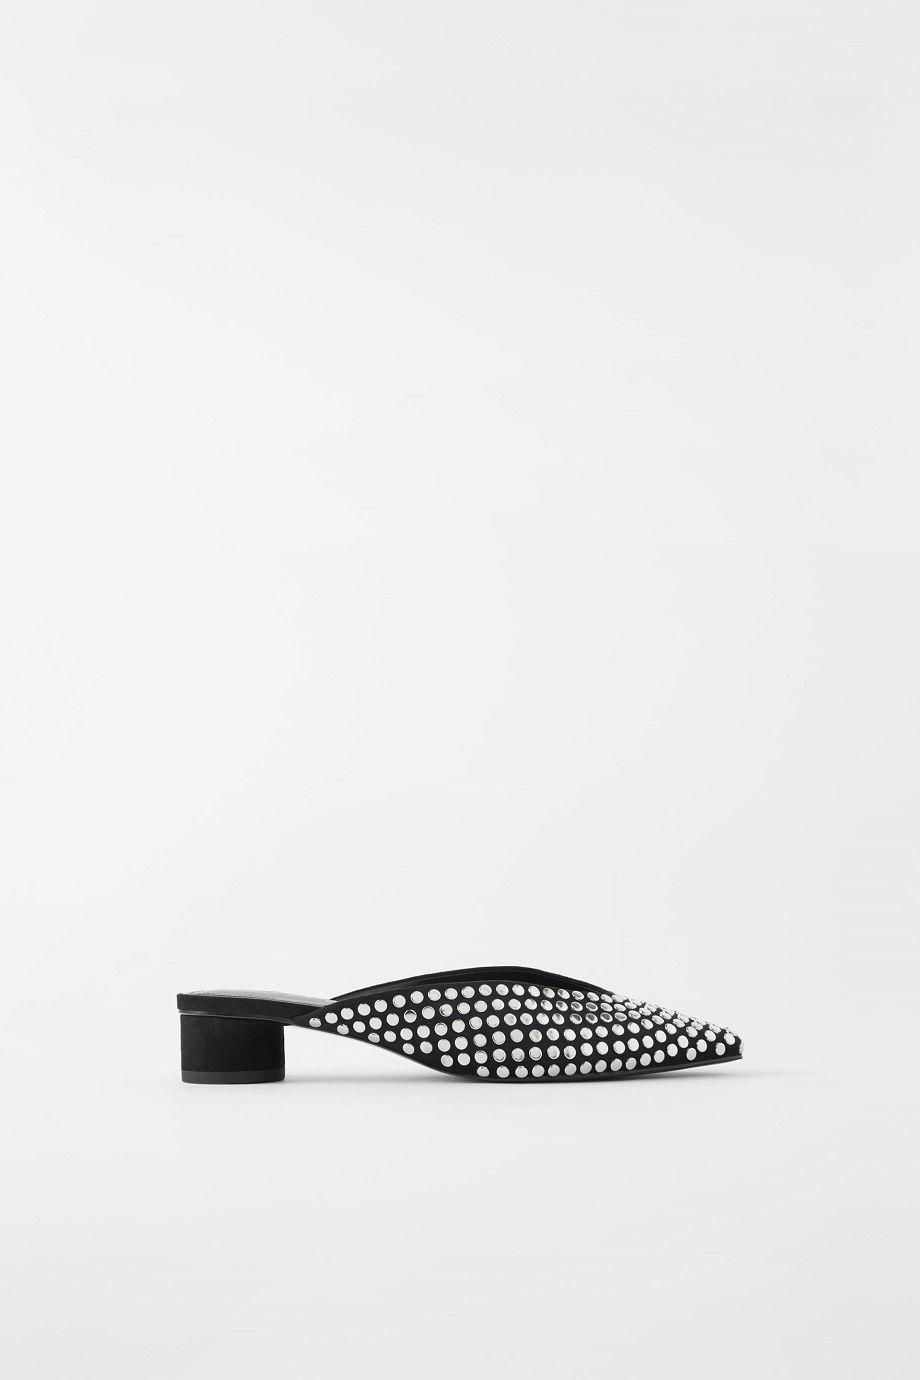 #PopbelaOOTD: Saatnya Upgrade Sepatu Hitam yang Baru!